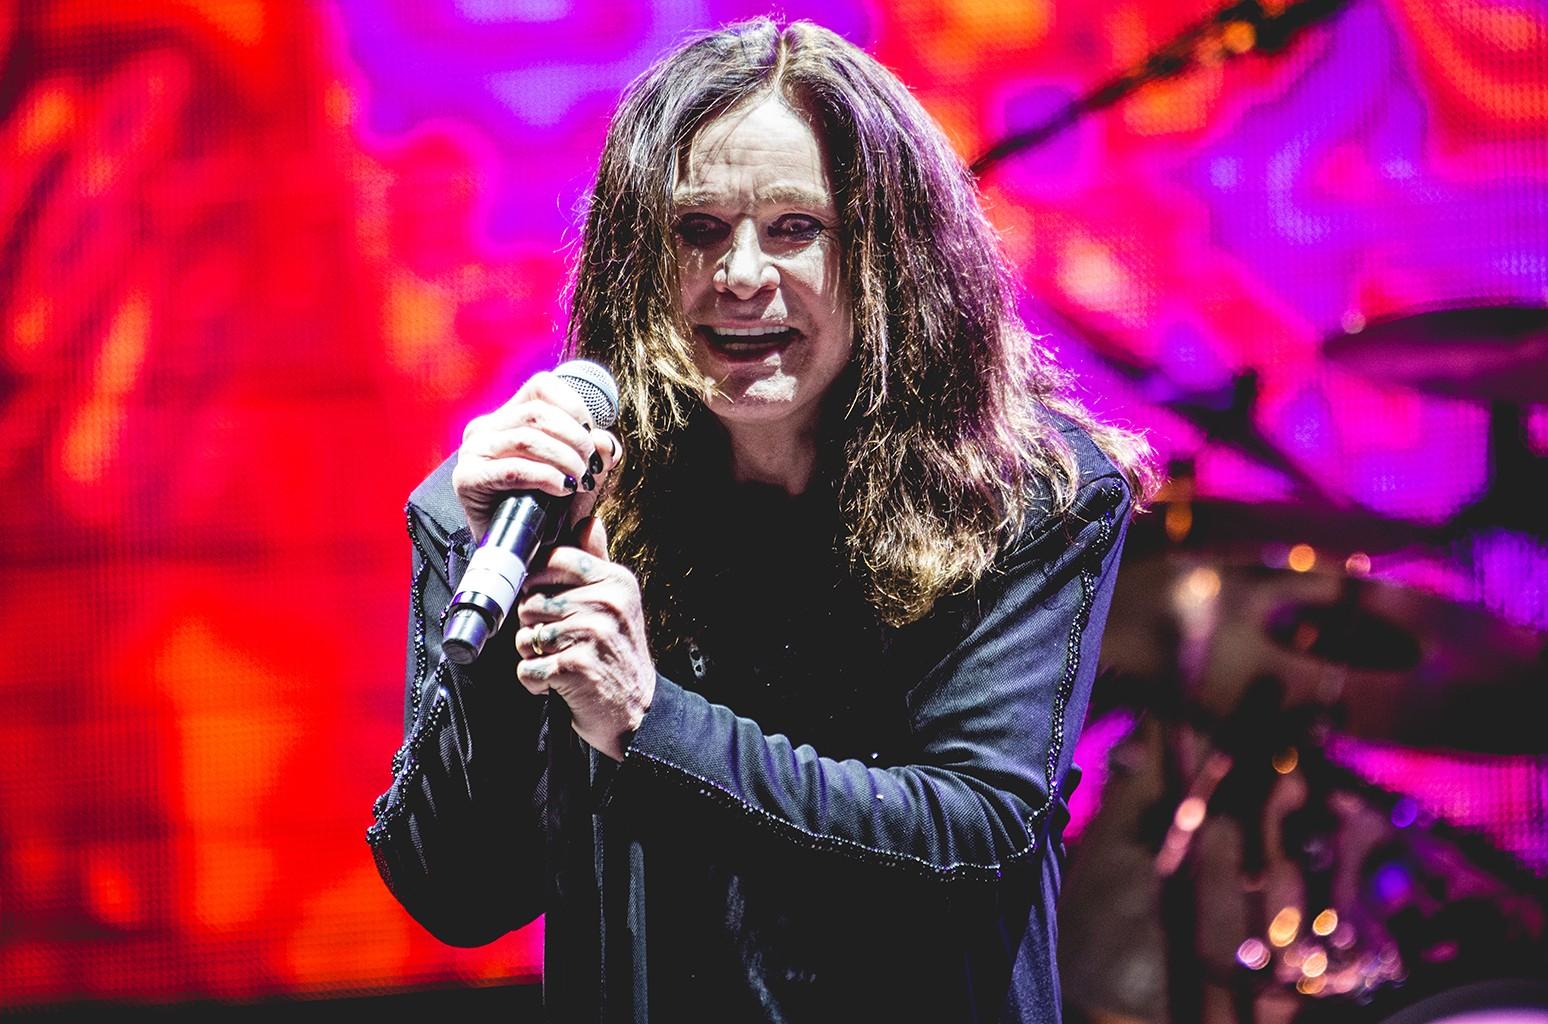 Ozzy Osbourne performs in Verona Italy